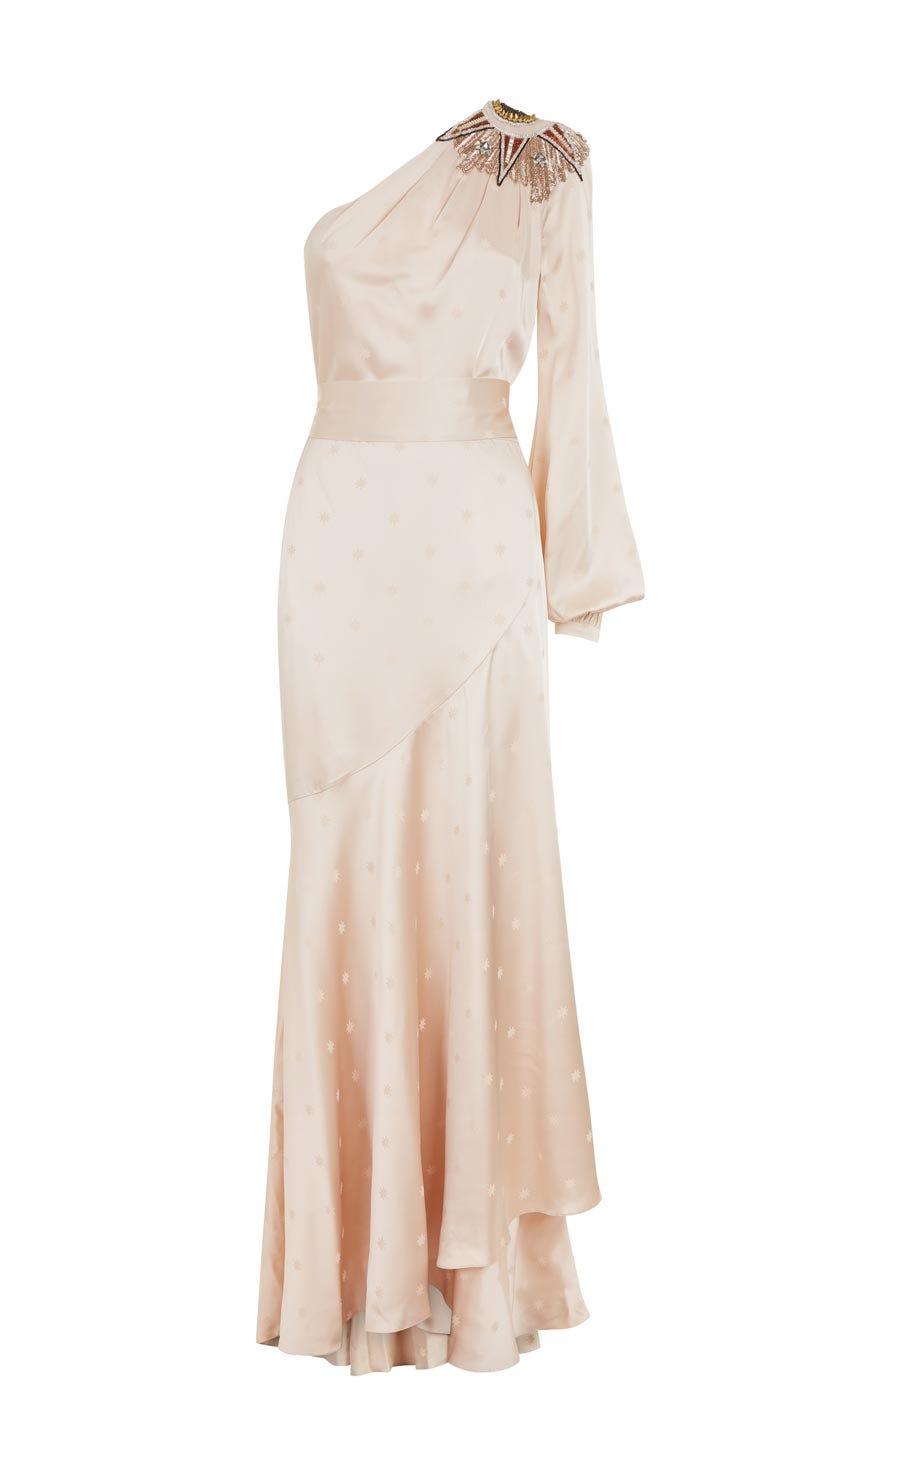 Parachute Asymmetric Dress